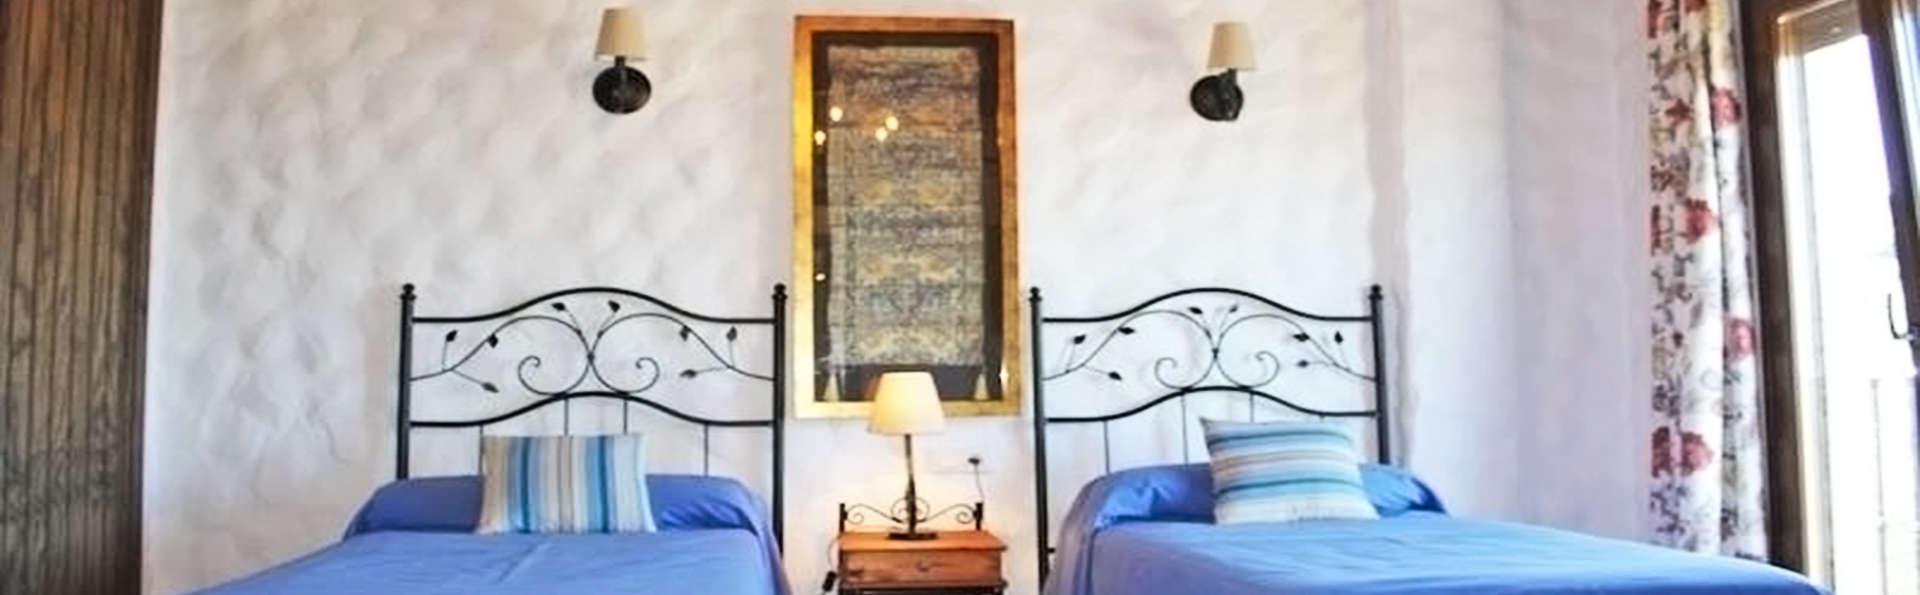 Hotel Posada la Plaza - EDIT_INT_ROOM_17.jpg